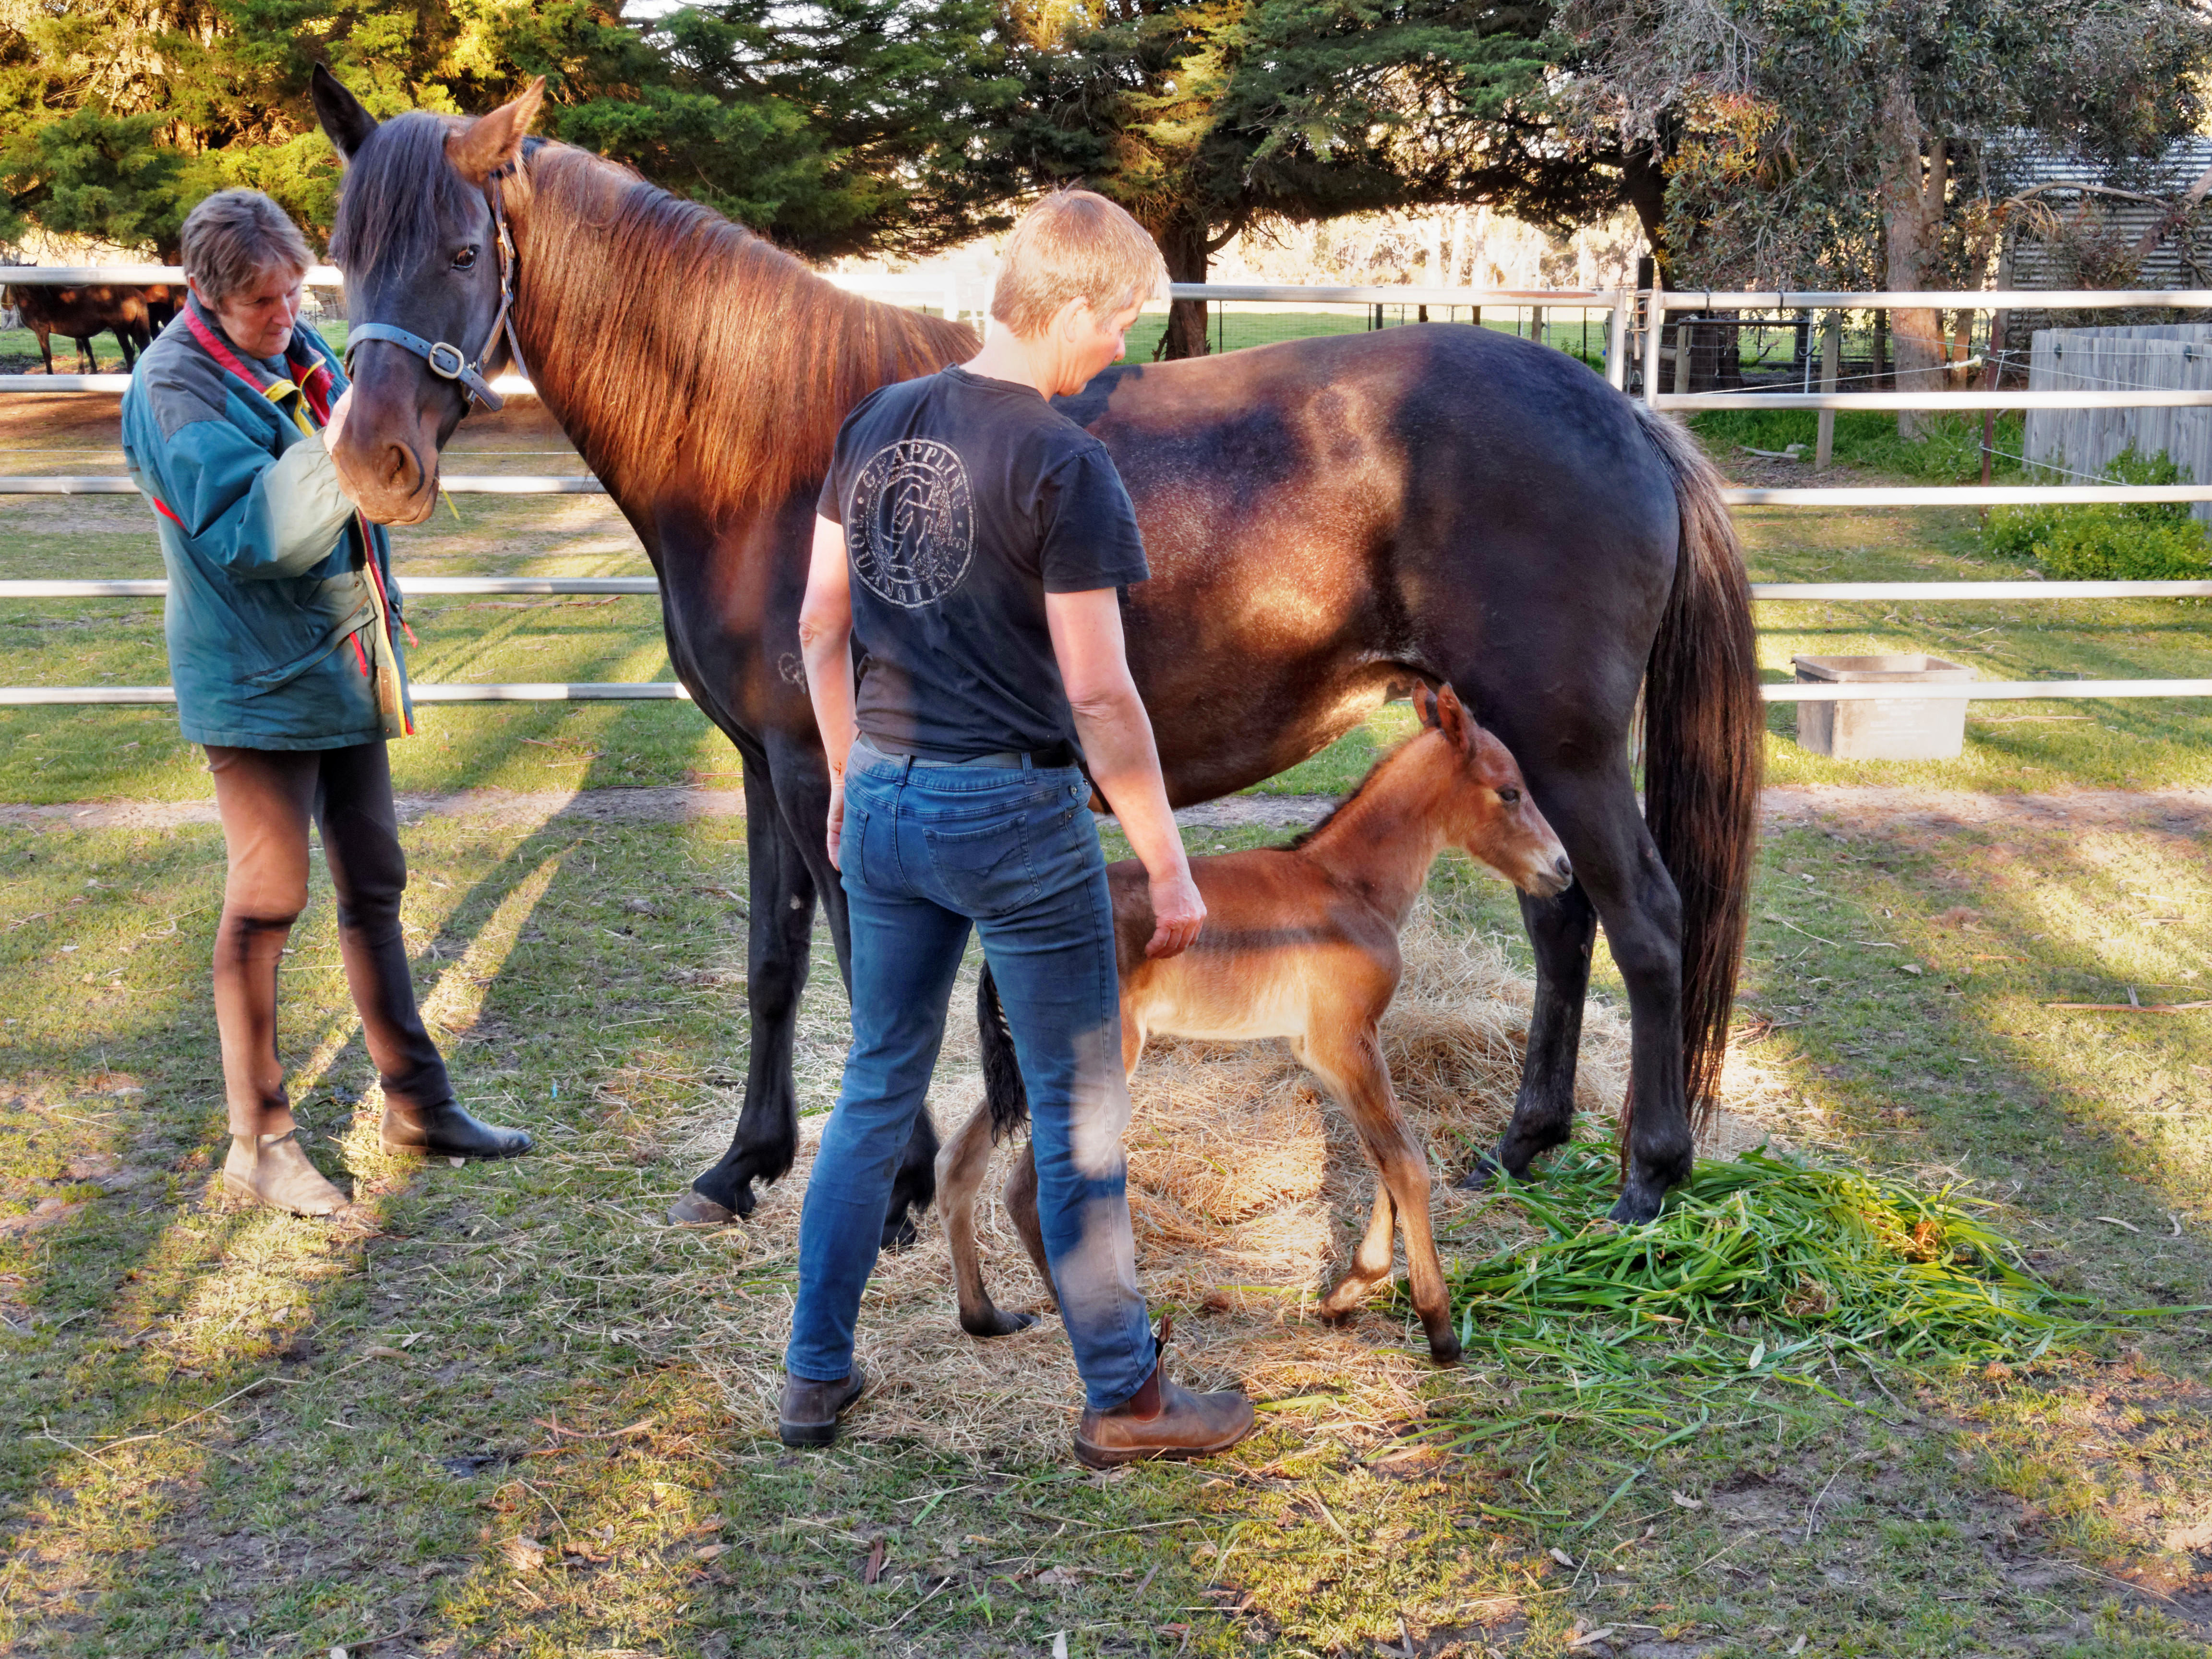 New-foal-18.jpeg